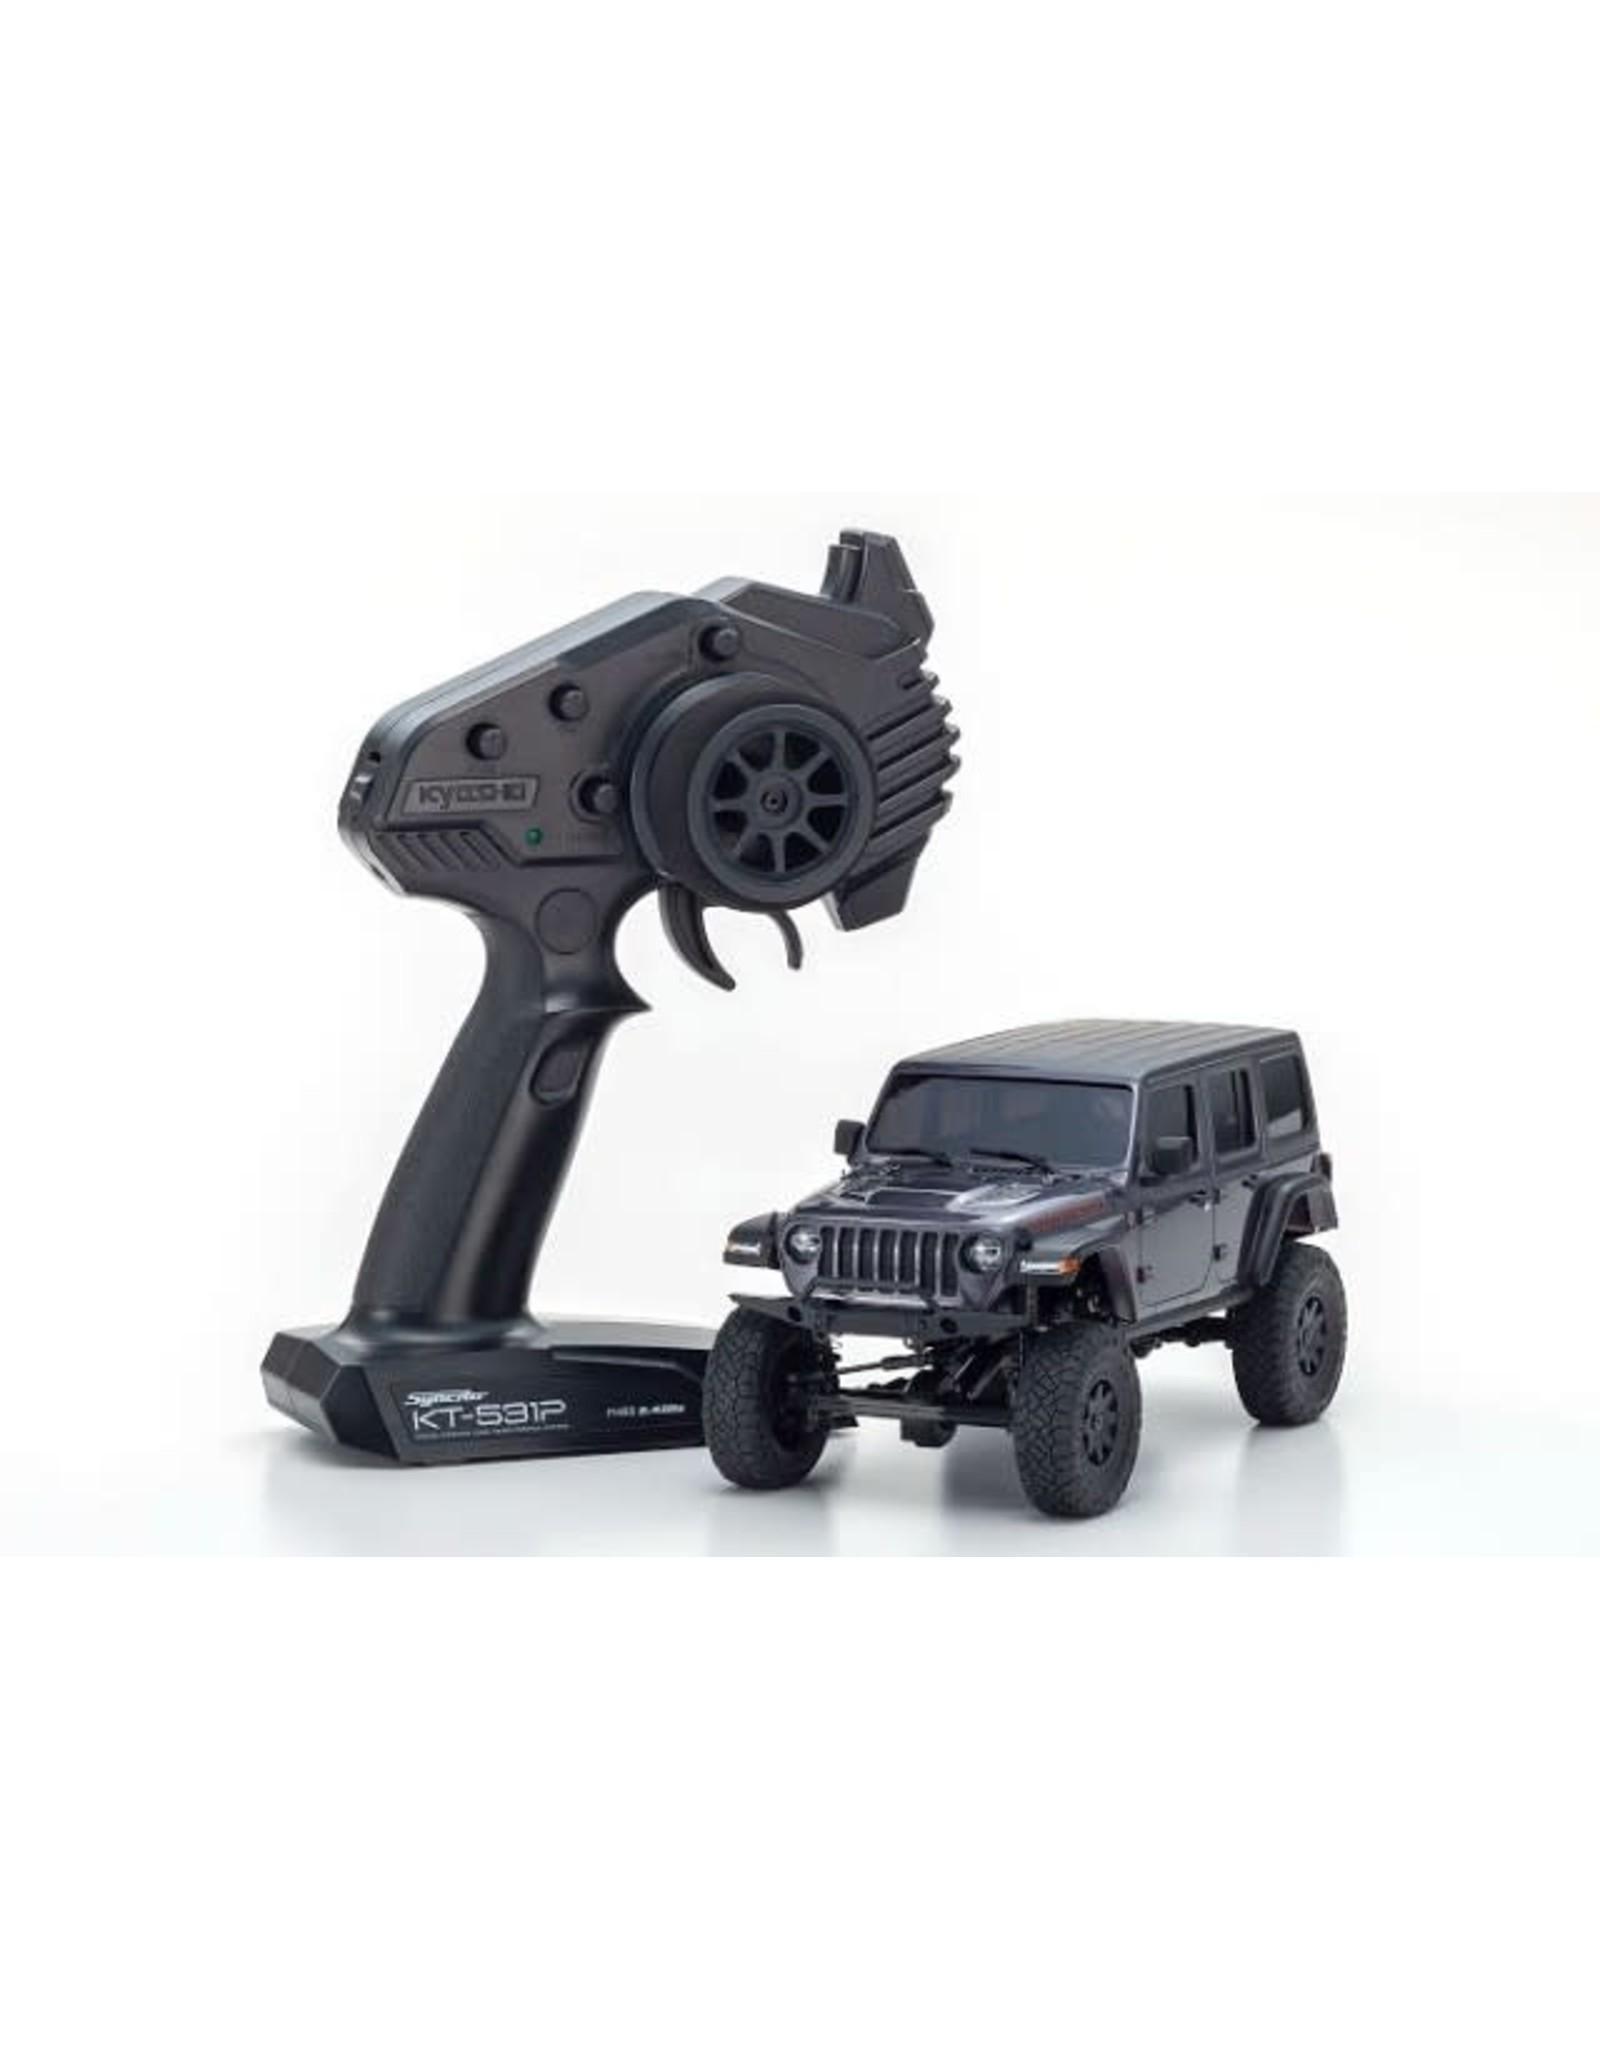 Kyosho 32521GM MINI-Z 4×4 Jeep Wrangler Unlimited Rubicon Granite Crystal Metallic RS